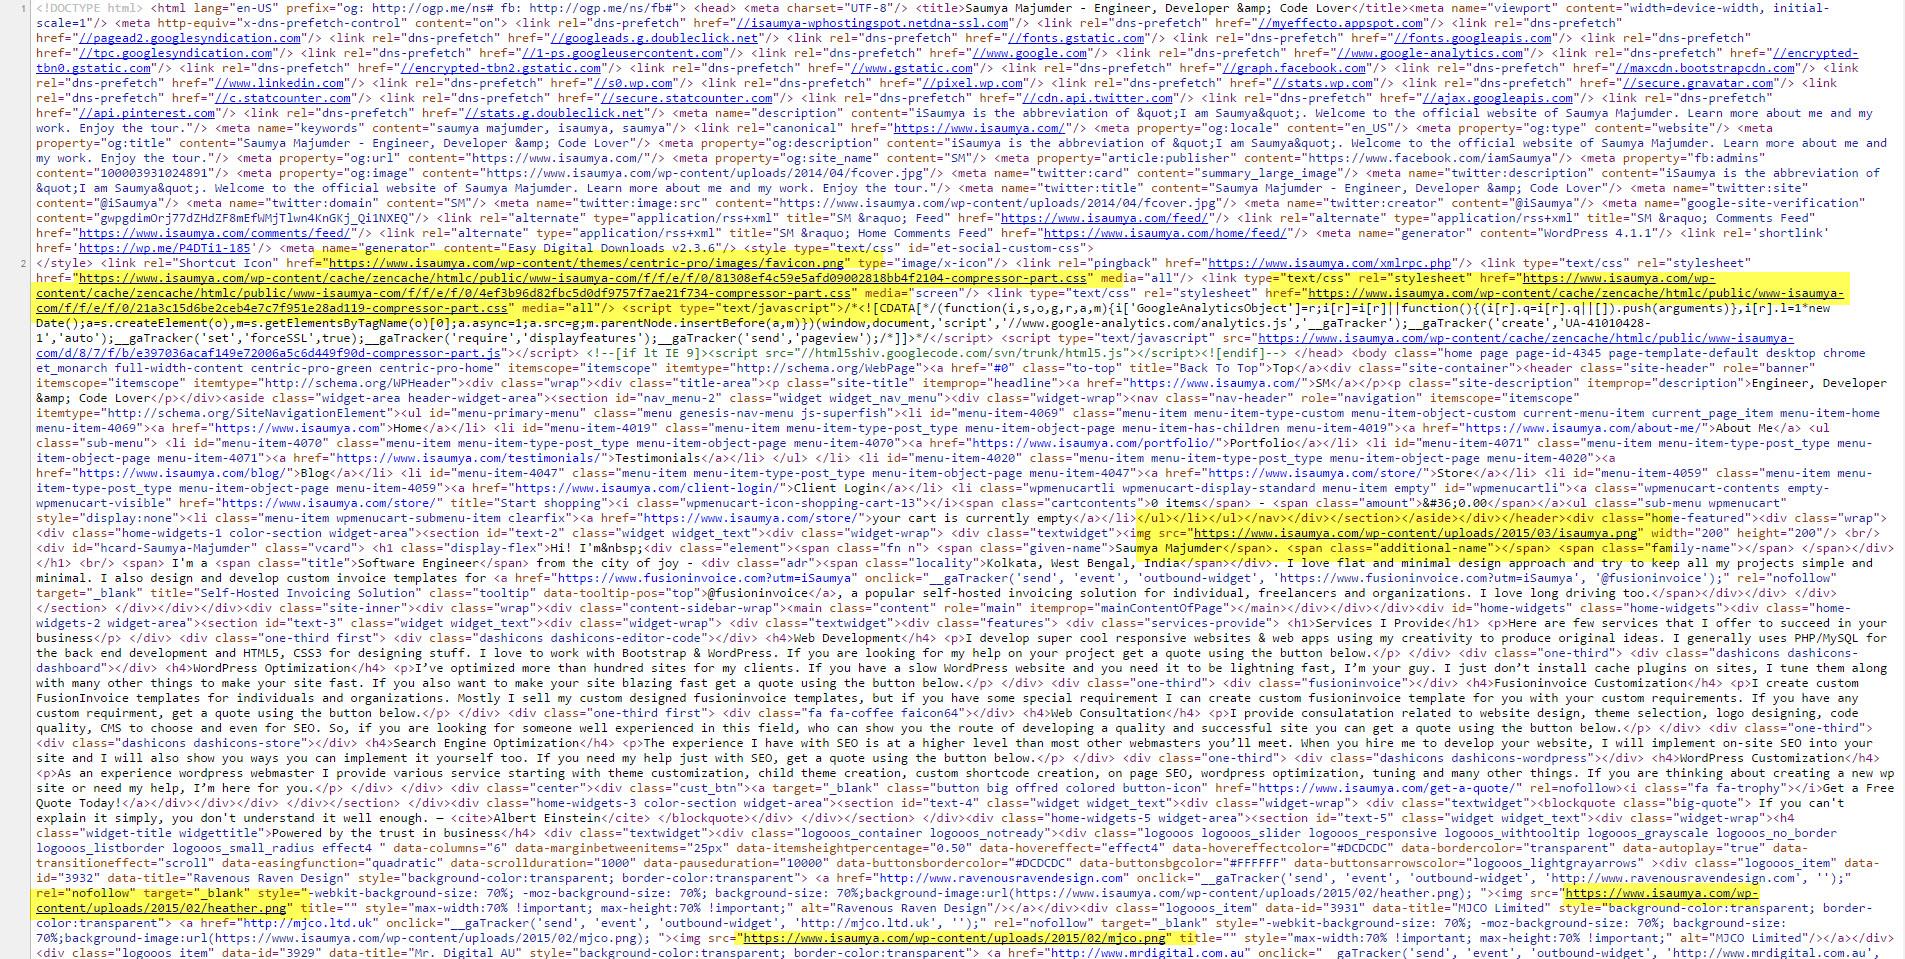 Frontend Source Code - HTML Compressor ENABLED